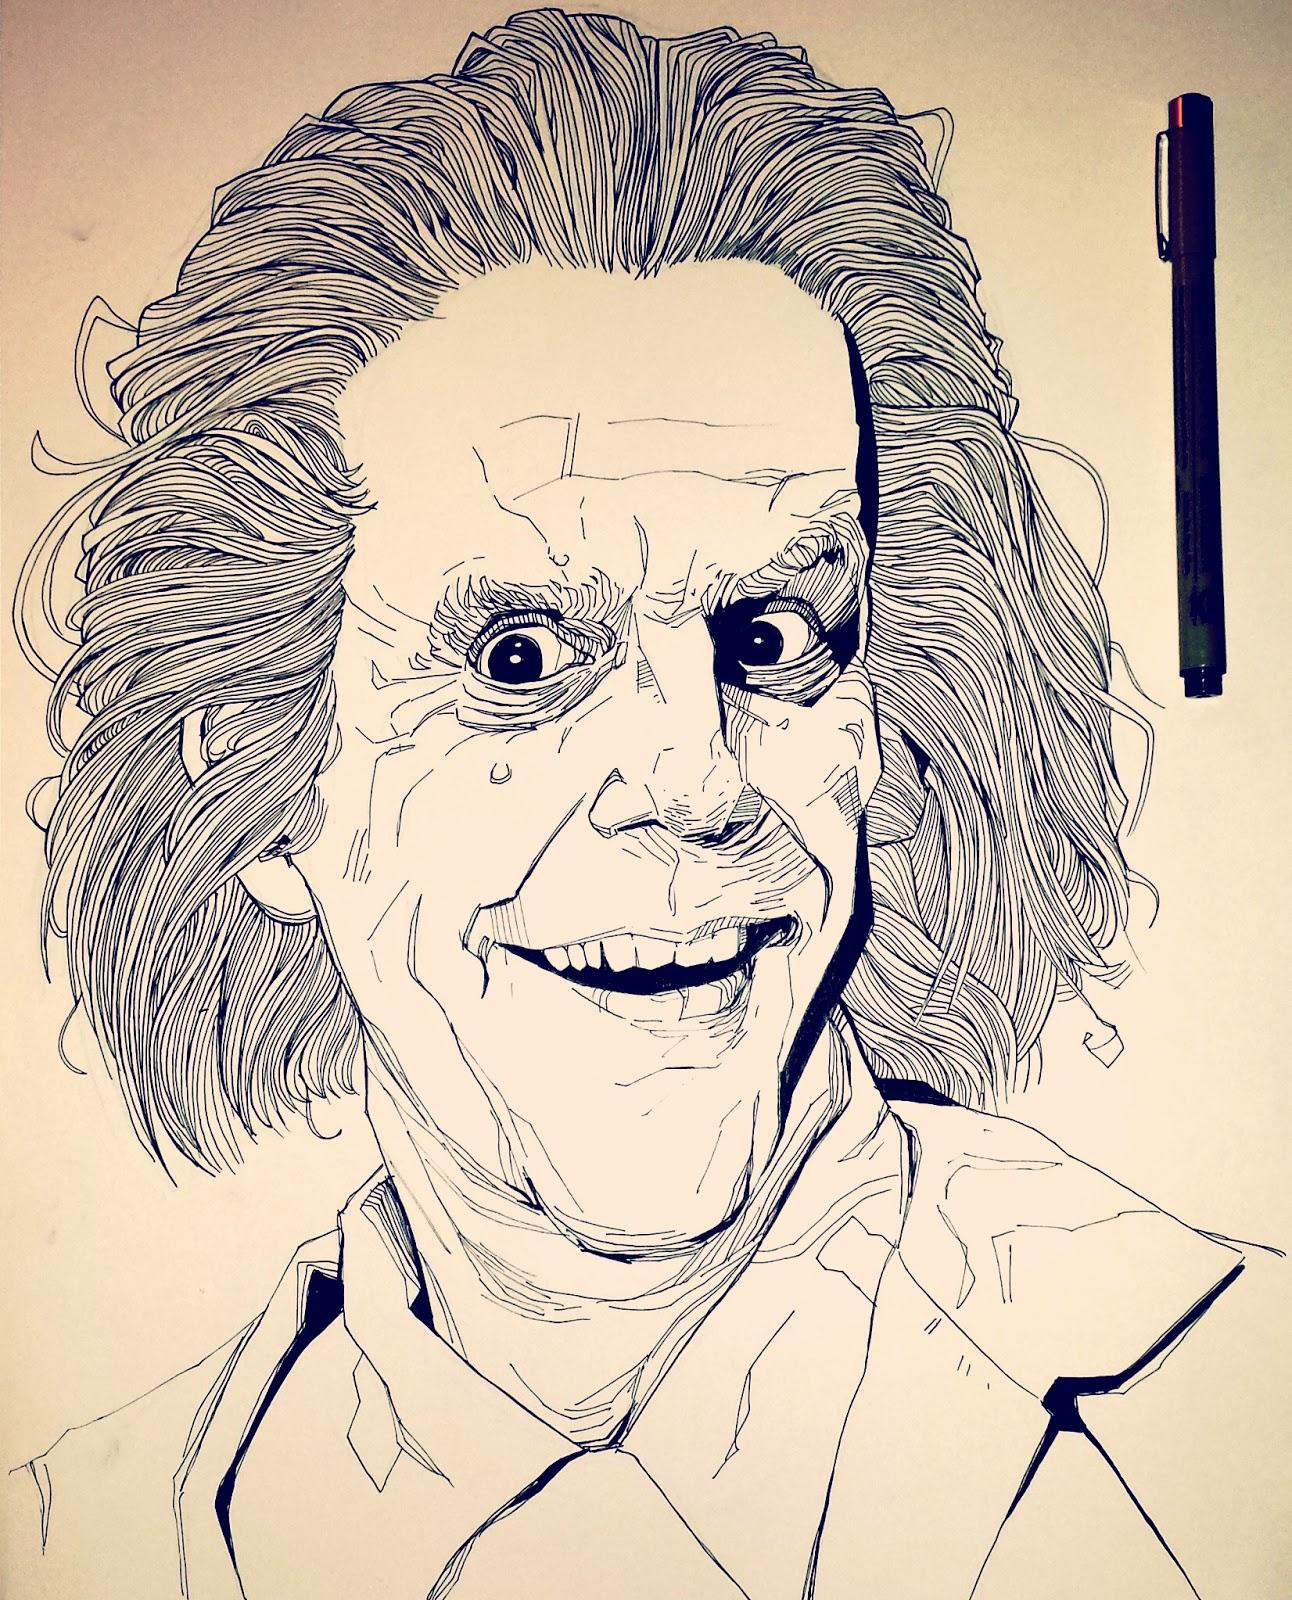 Illustration portrait christopher lloyd as Doc Brown